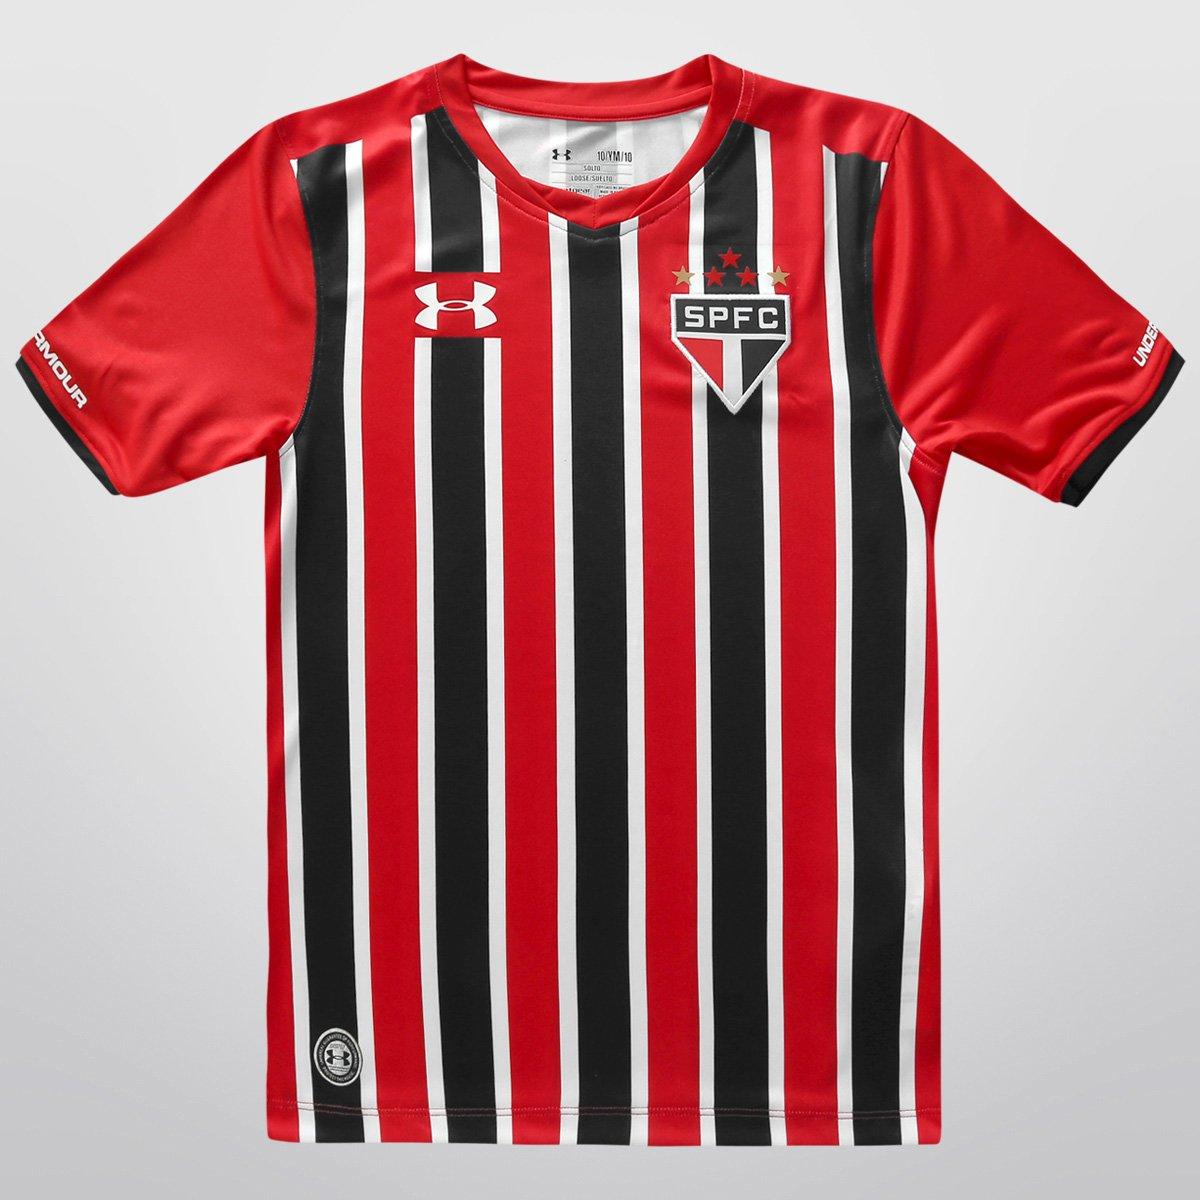 ... Camisa São Paulo Infantil II 15 16 s n° Torcedor Under Armour - Compre  Agora Zattini ... 4b3cf61921fbe